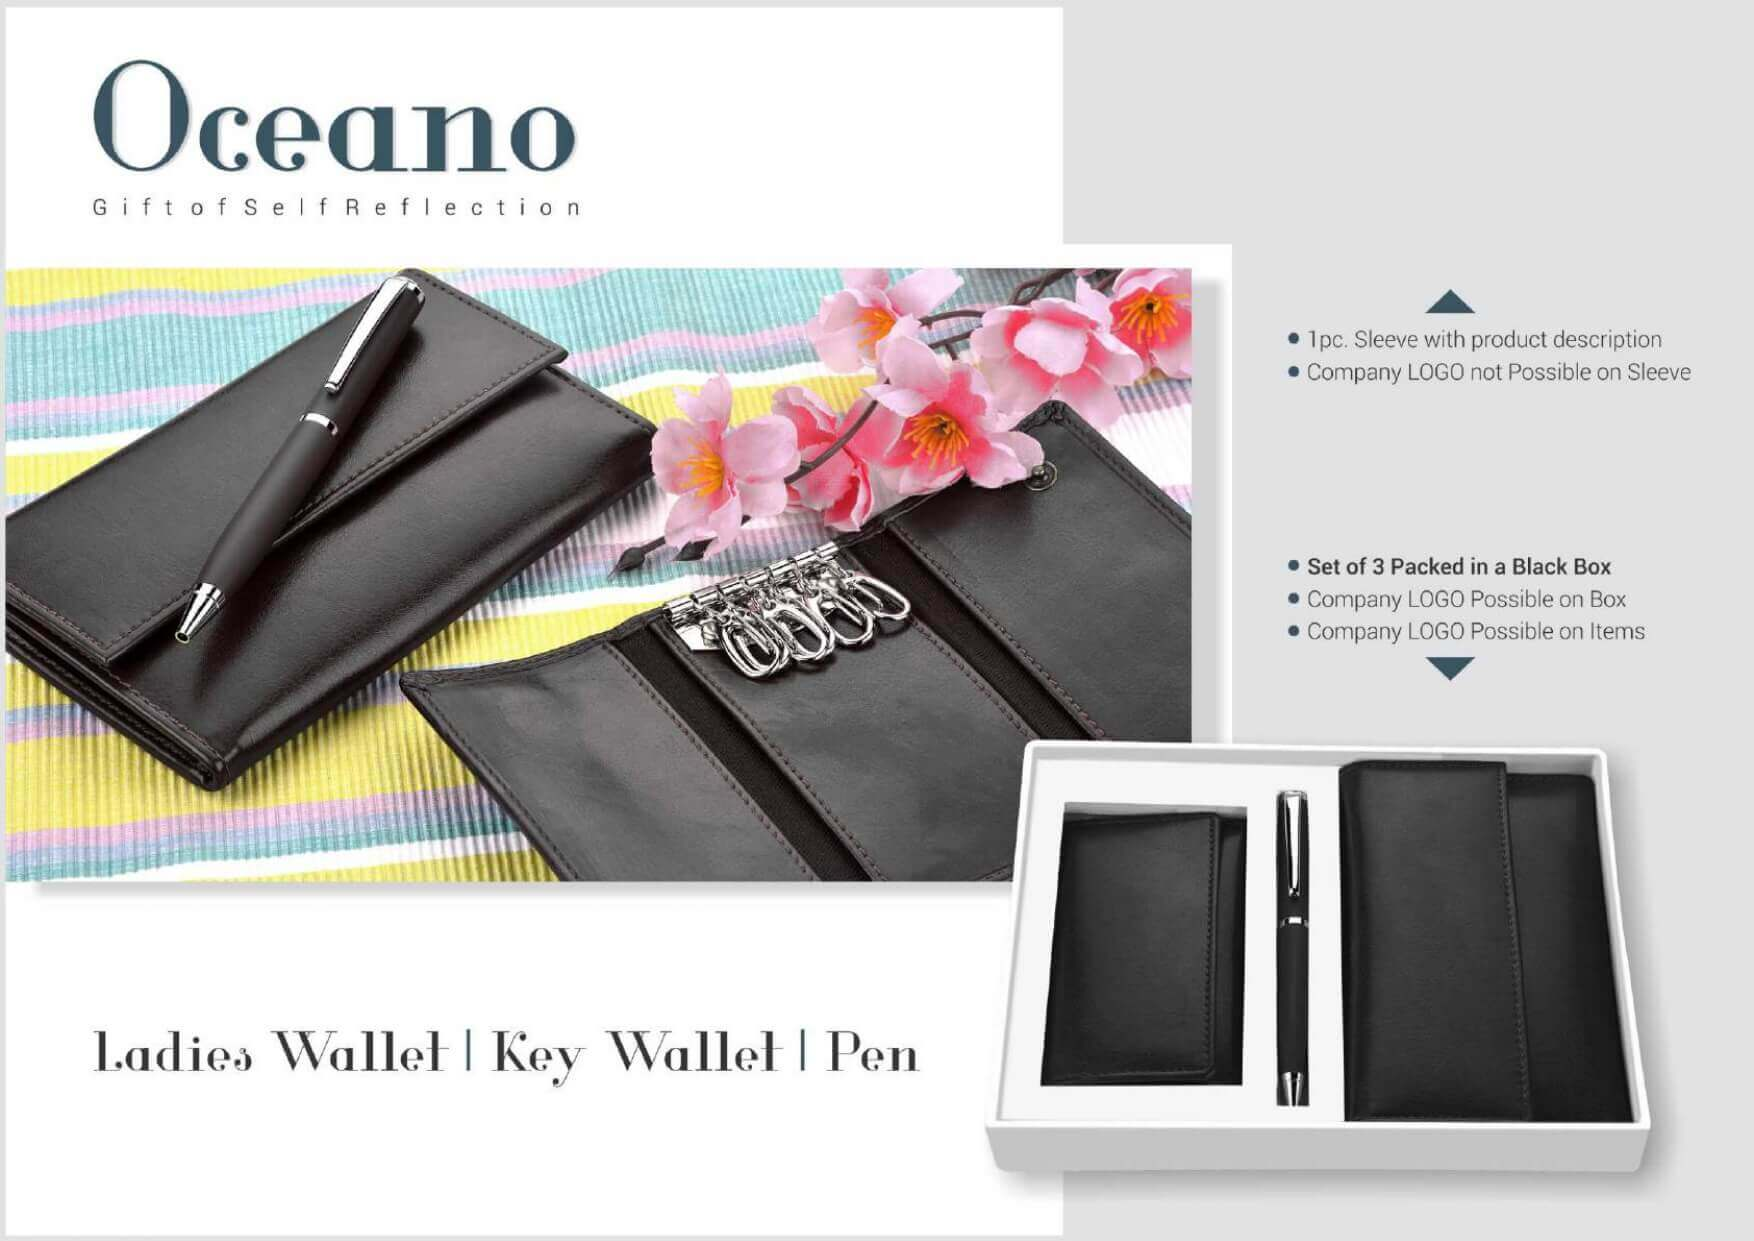 Ladies Wallet Key Holder & Pen Set (3 in 1) Oceano